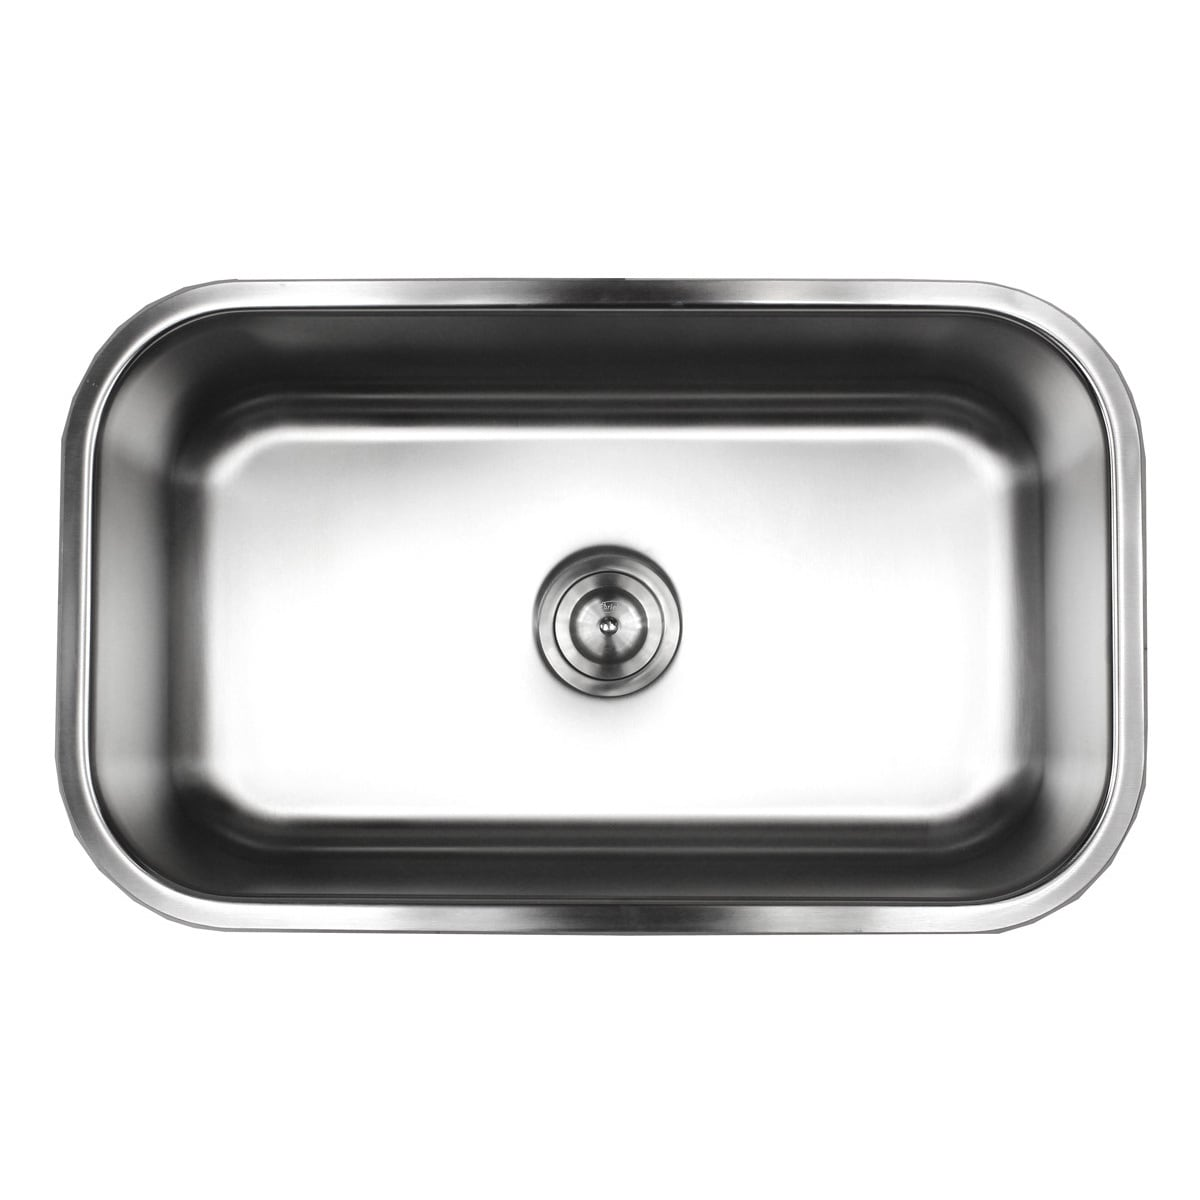 Brushed Satin 18-gauge Stainless Steel 30-inch Undermount Single-bowl  Kitchen with Sink Basket Strainer